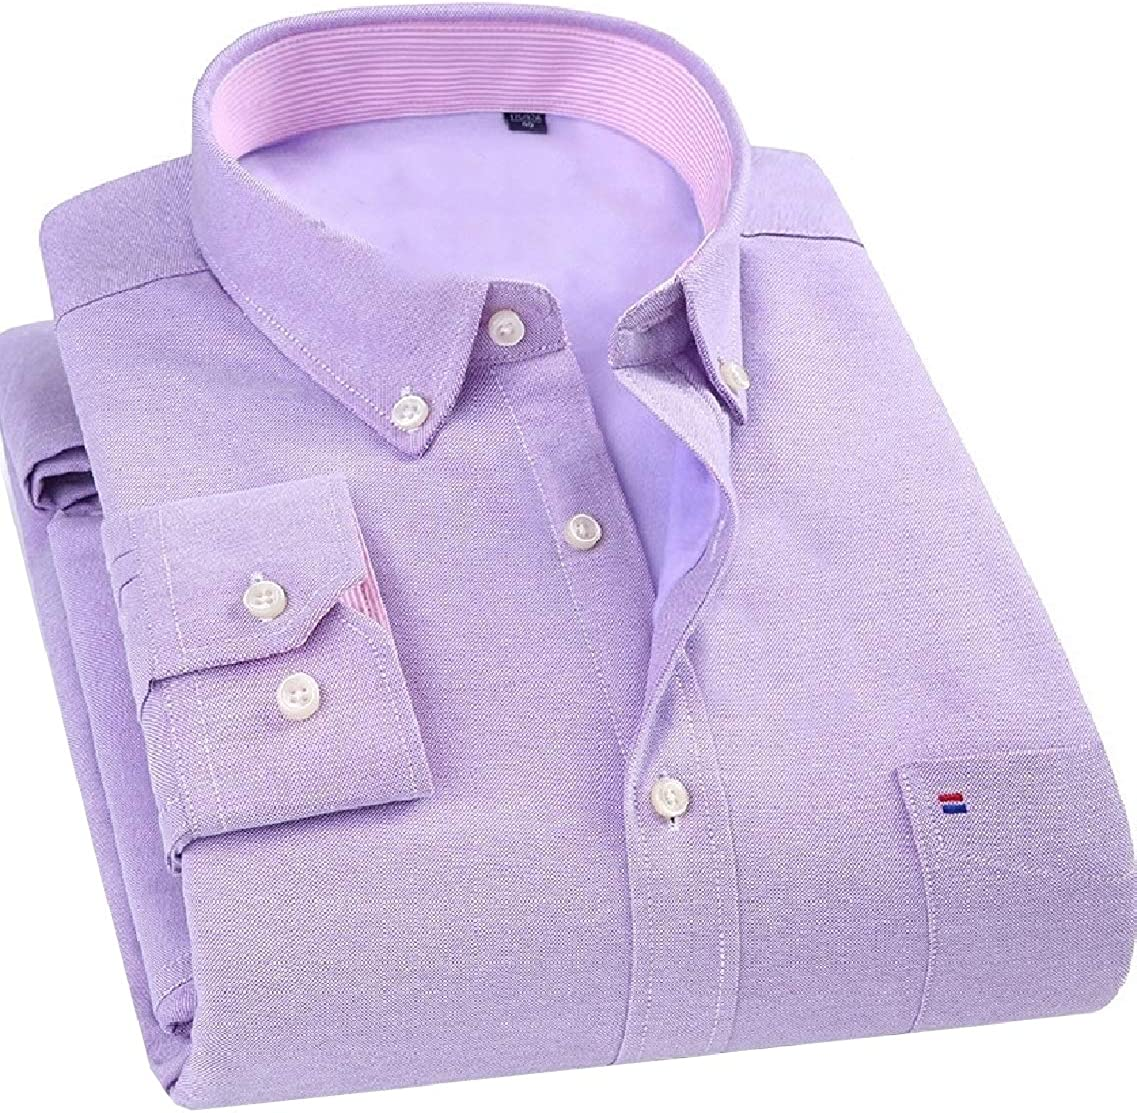 Highisa Men Plus Velvet Thickening Slim Fit Leisure Comfort Business Shirts Purple 38